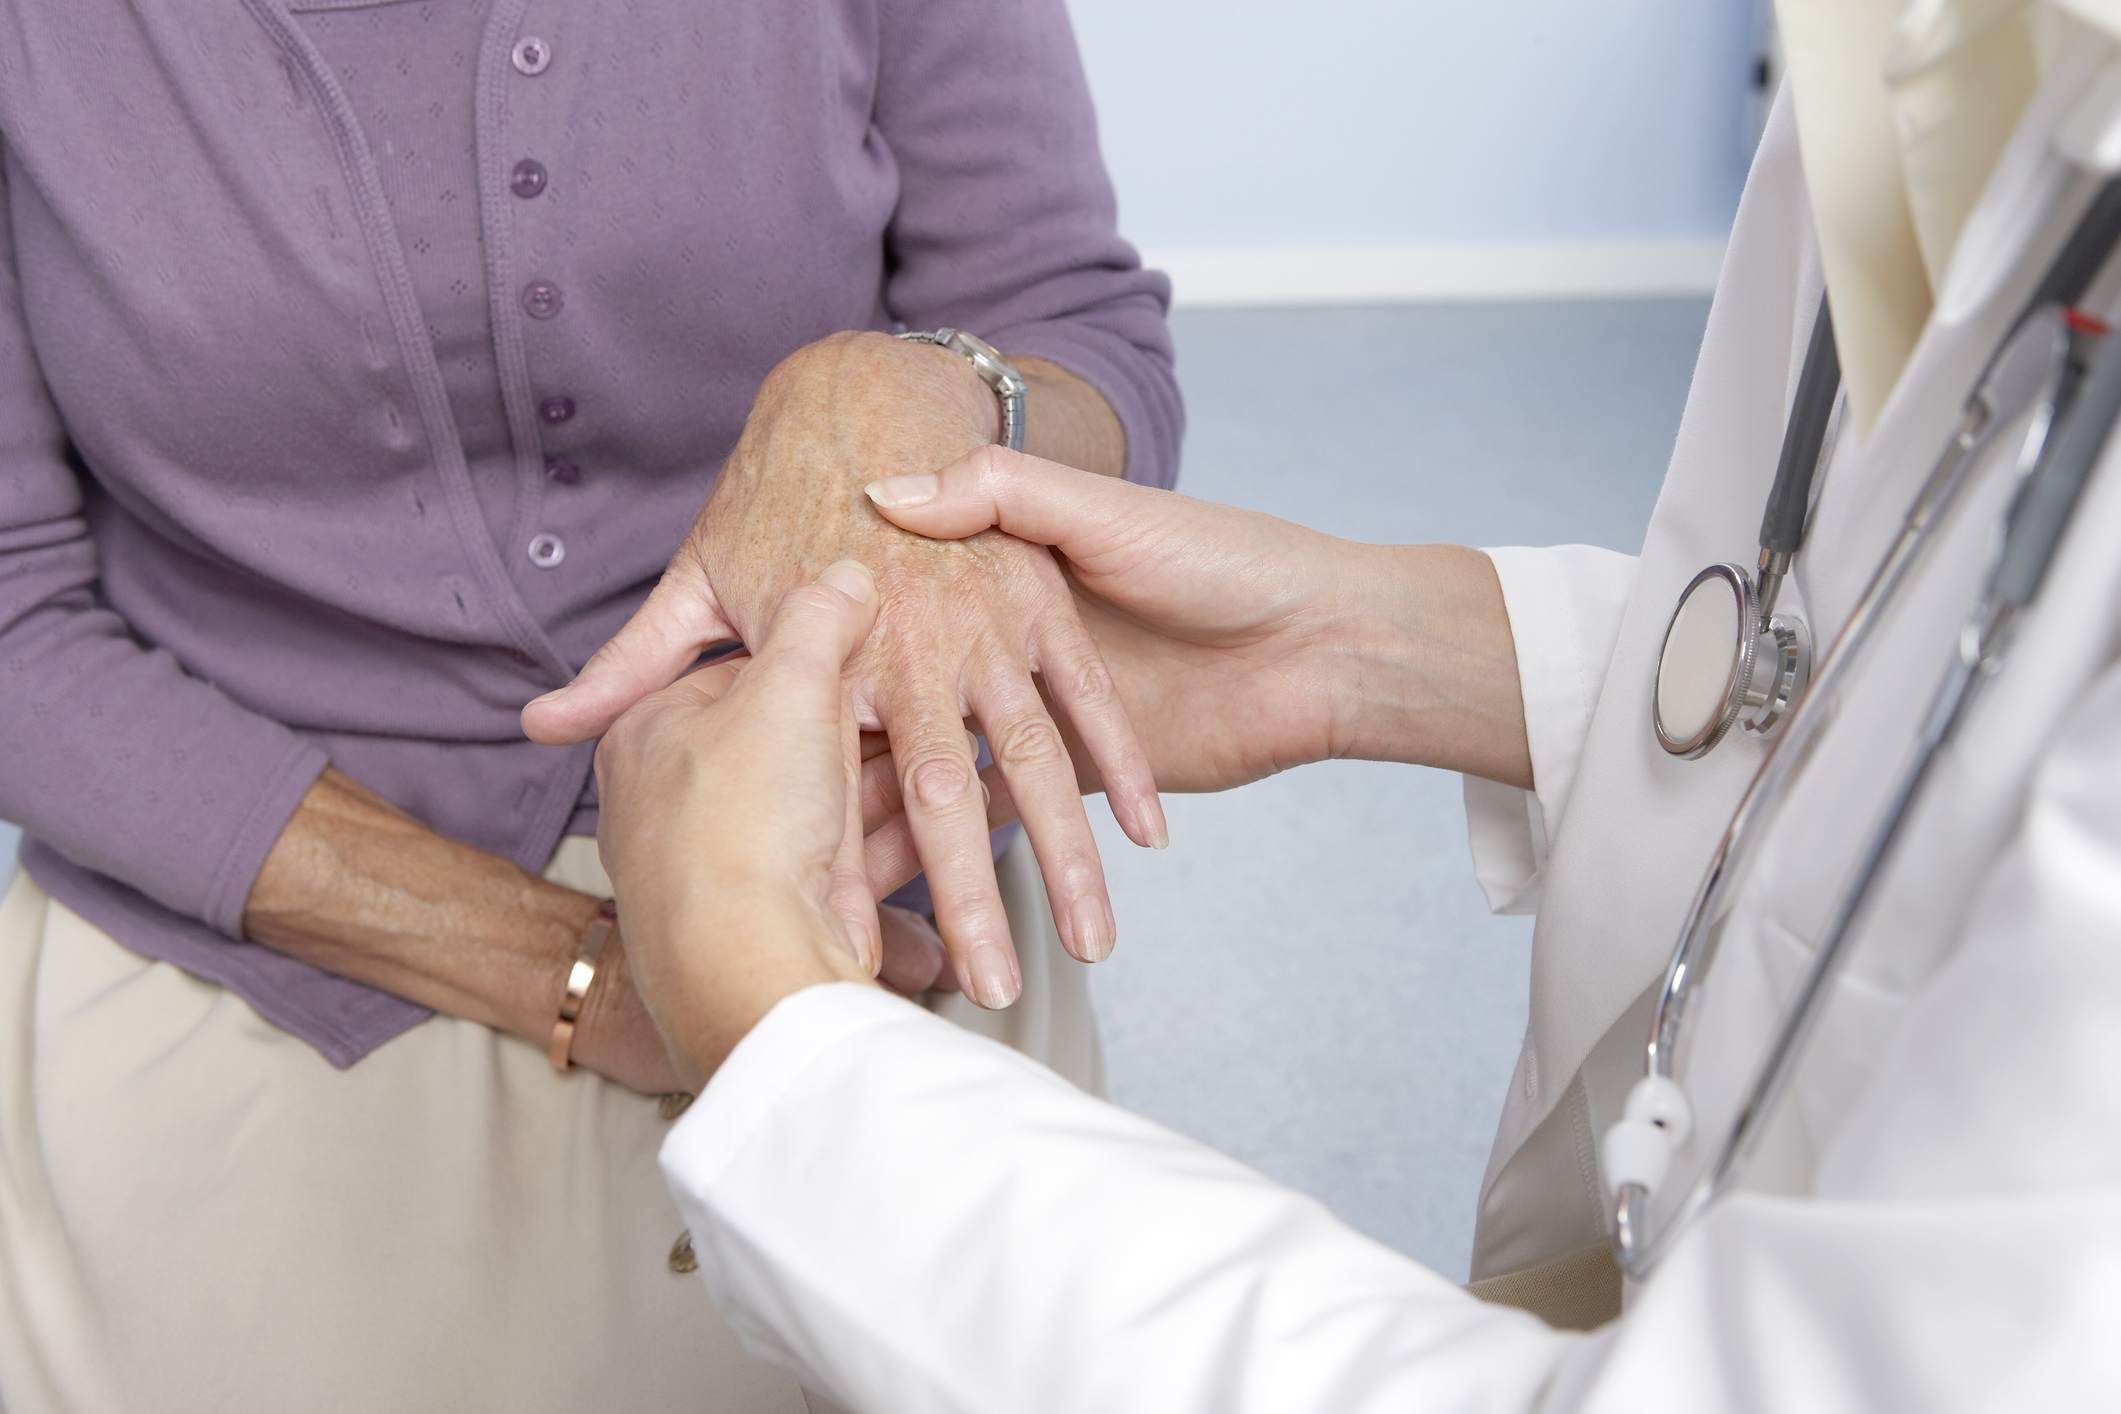 Doctor examining woman's hands